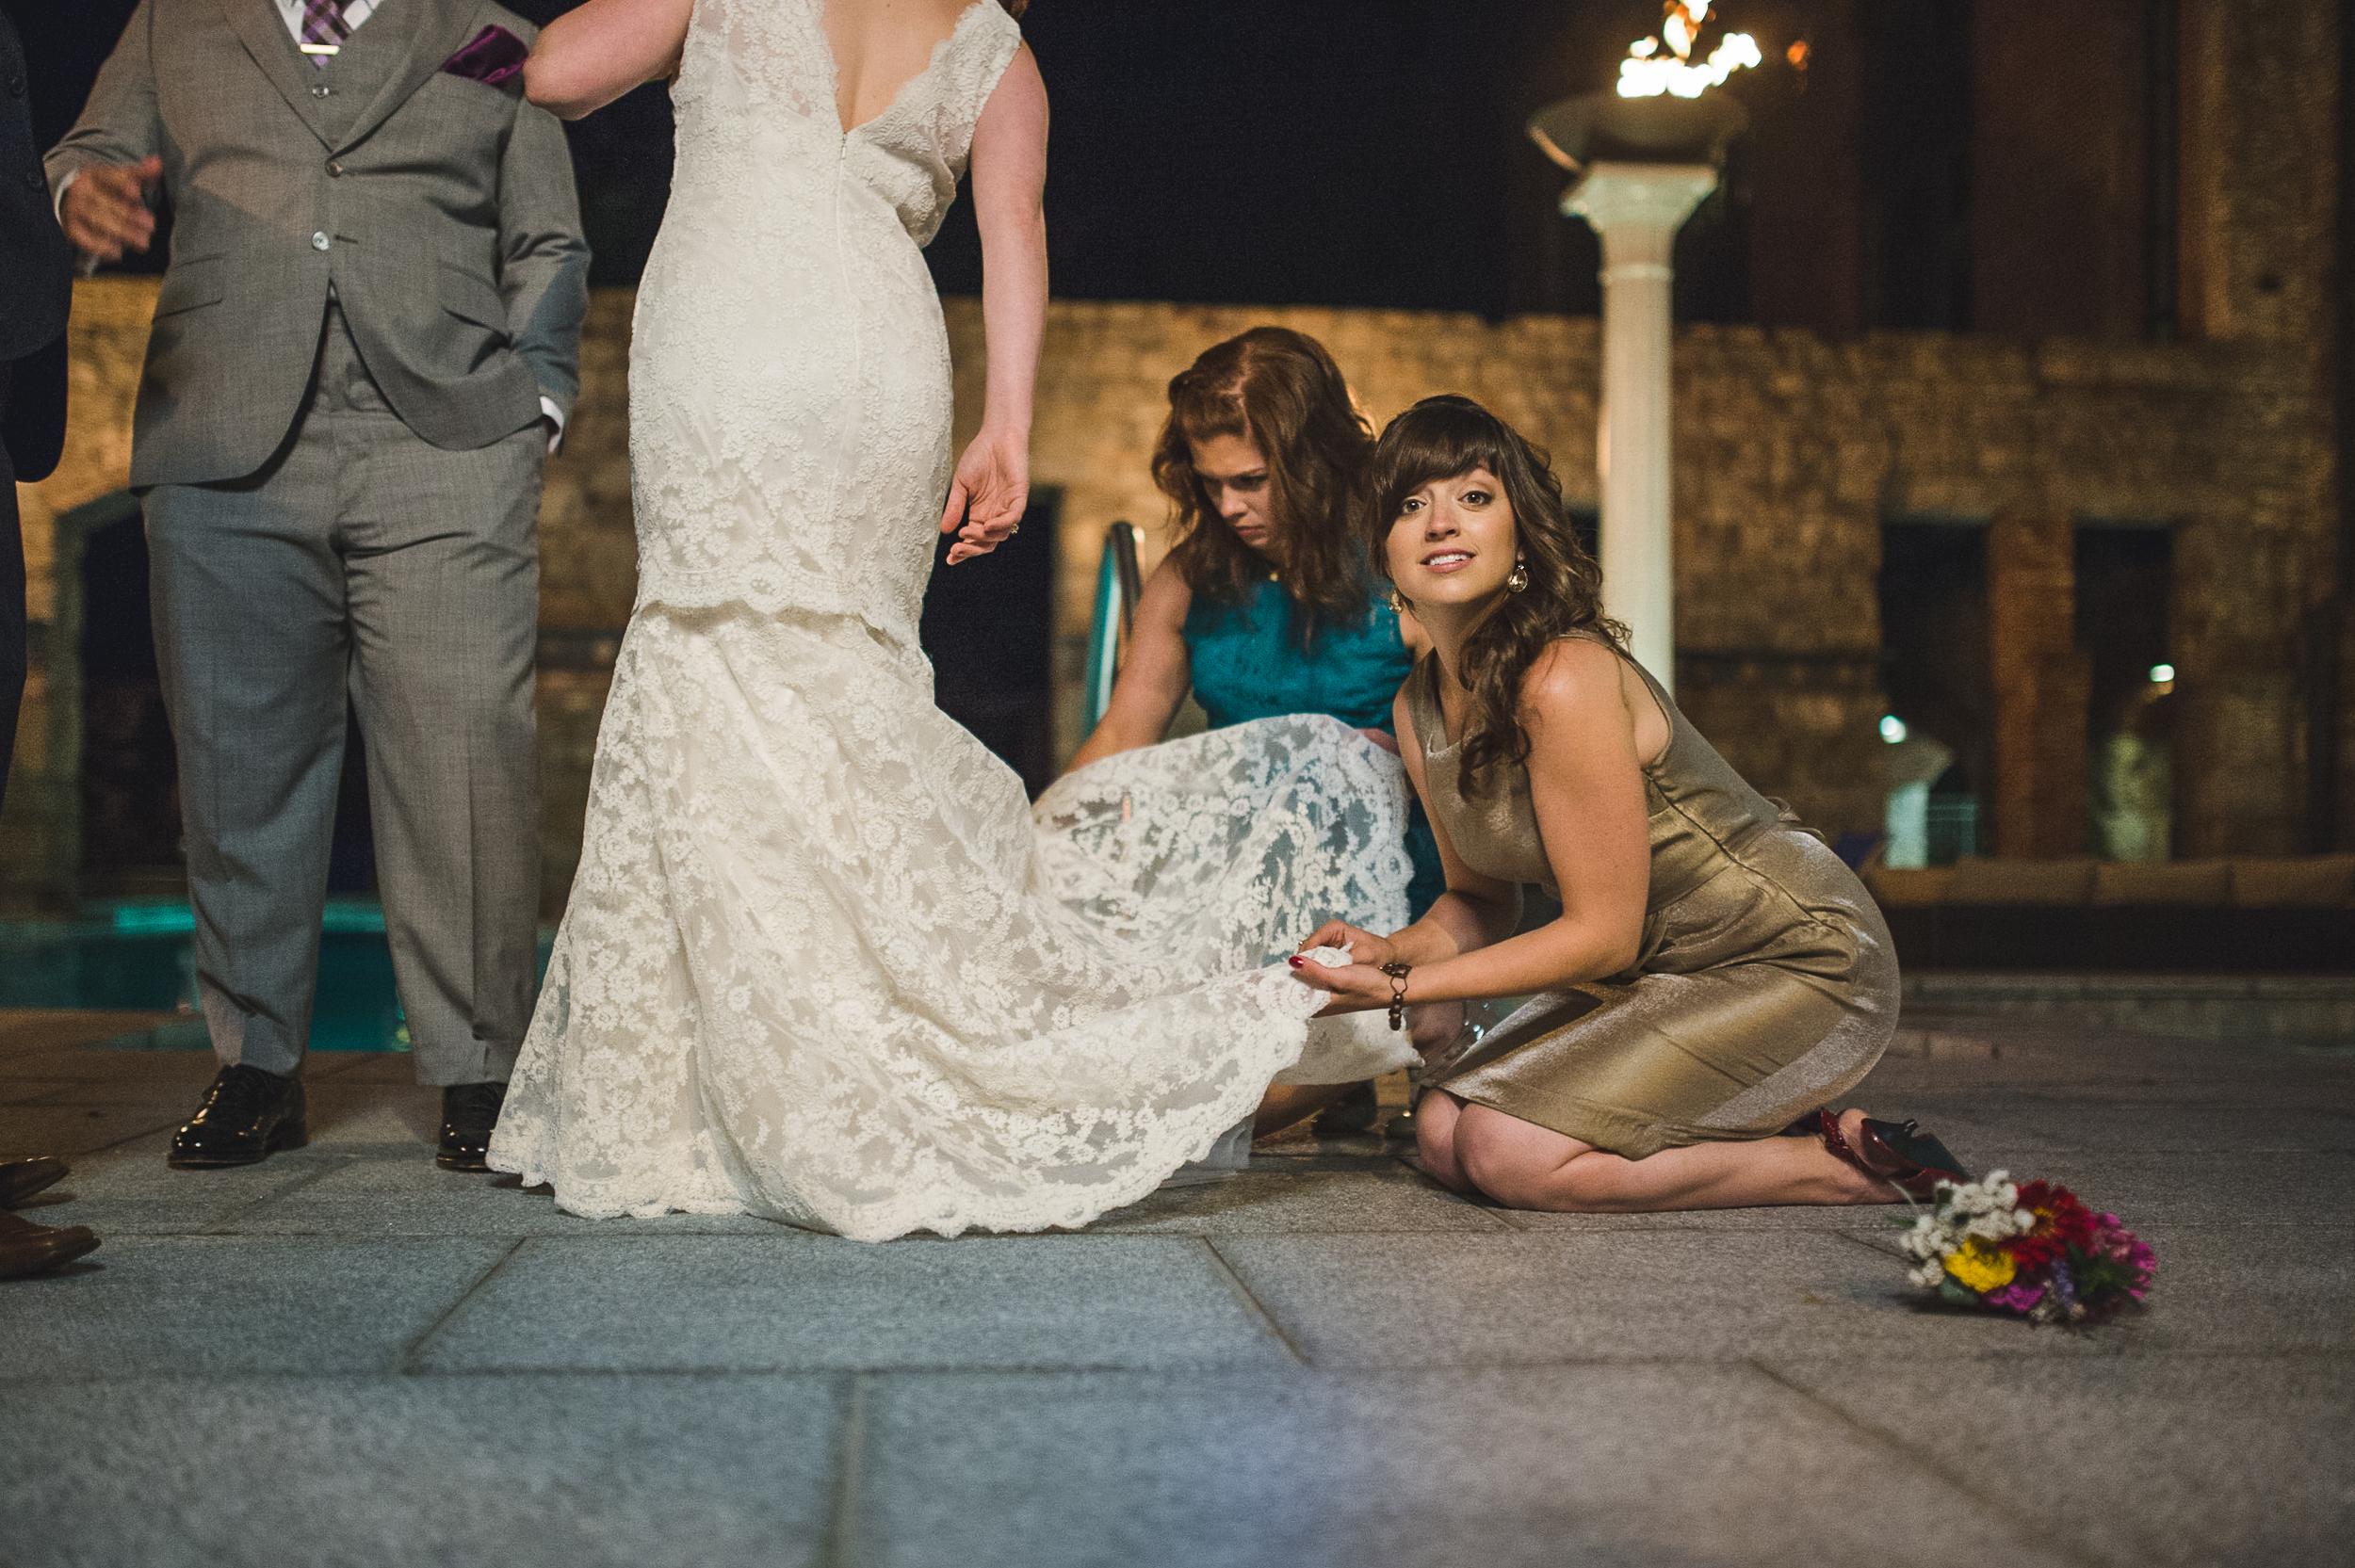 Documentary wedding photographer washington dc Mantas Kubilinskas Photography_-23.jpg